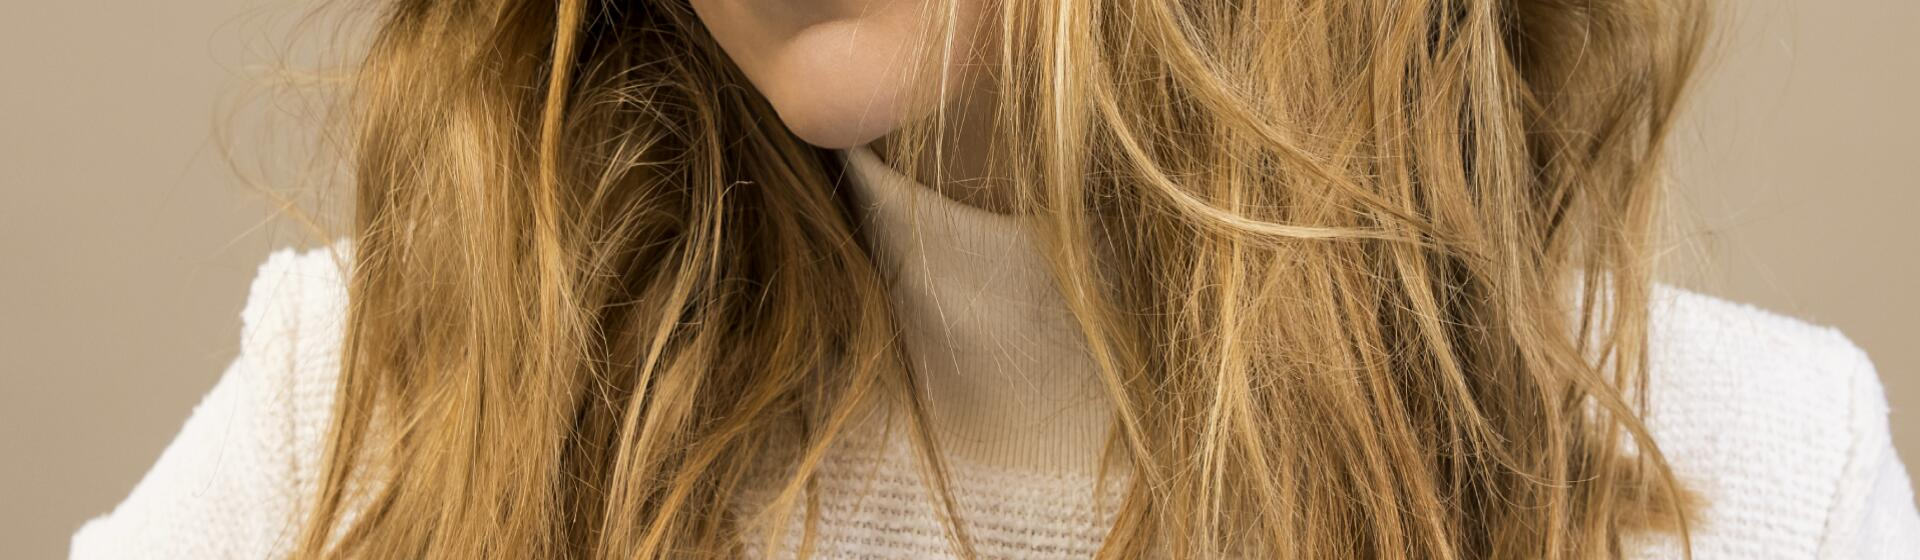 RF_Expert-dossier_Dry-hair_Messy-hair-Woman_Copyright-free (2)